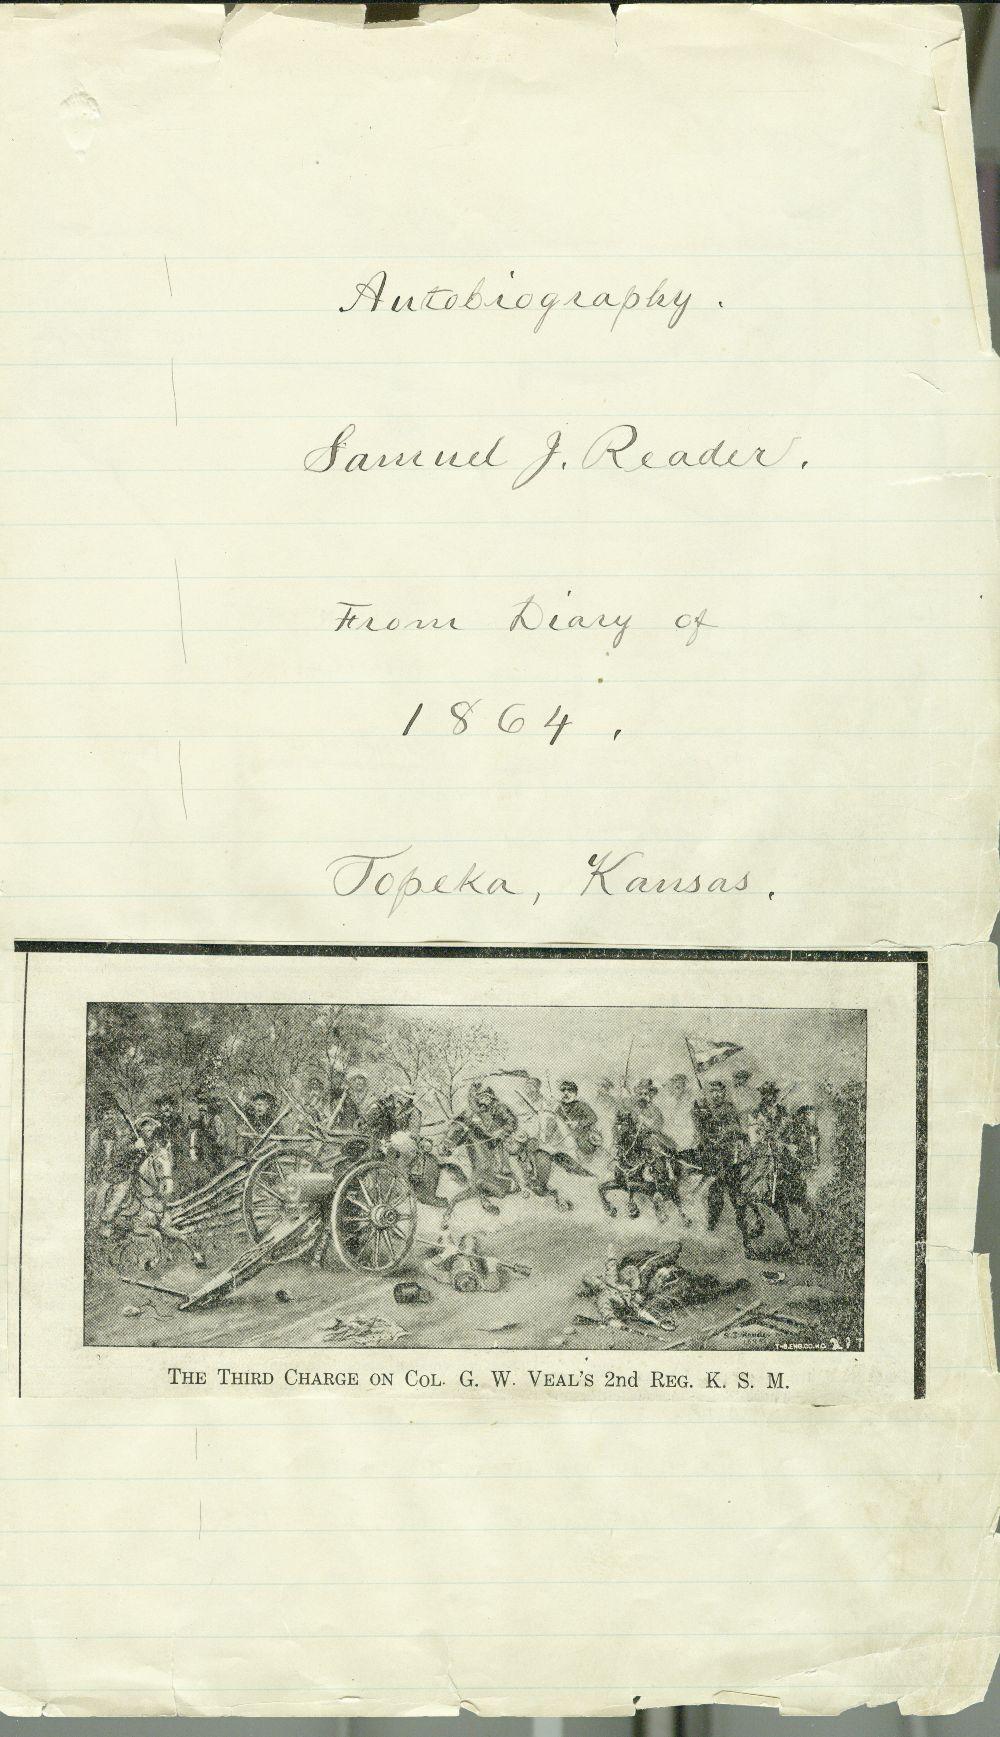 Samuel J. Reader's autobiography, volume 3 - 7